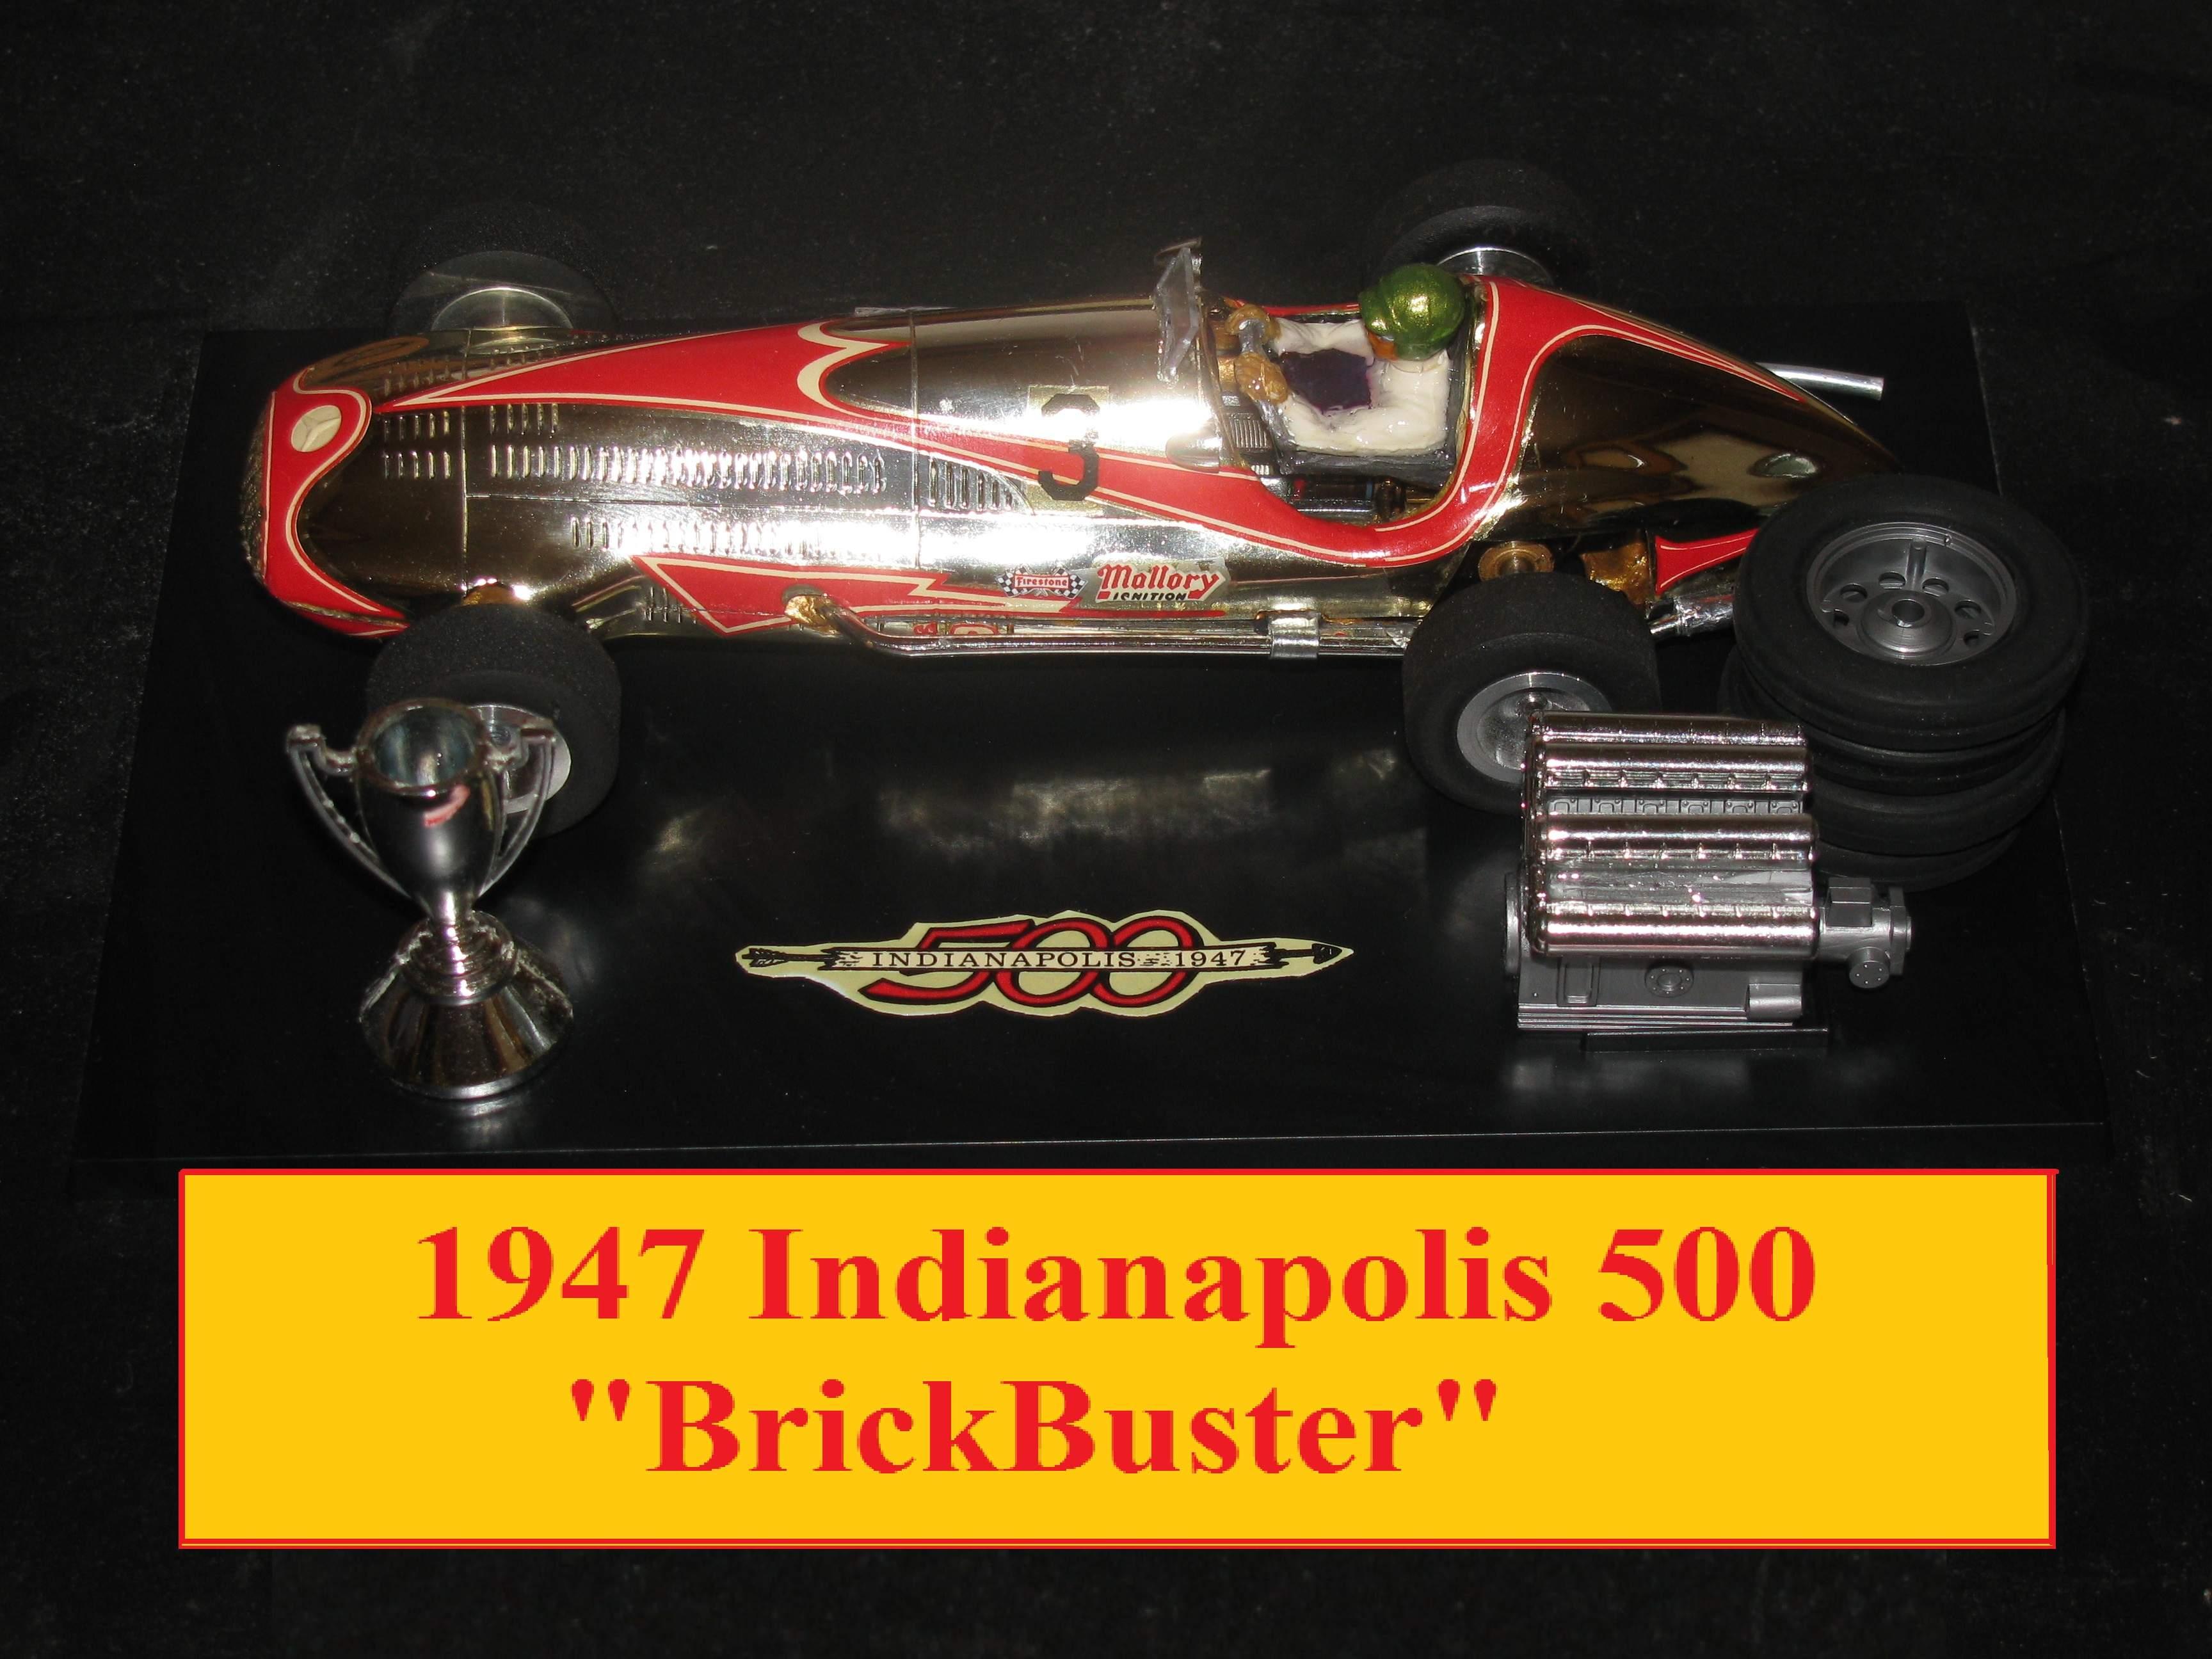 * Winter Super Sale * Stirling Moss 1939 Mercedes Benz (W163) Grand Prix Racer Indianapolis 500 'Brickbuster' 1/24 Scale Slot Car